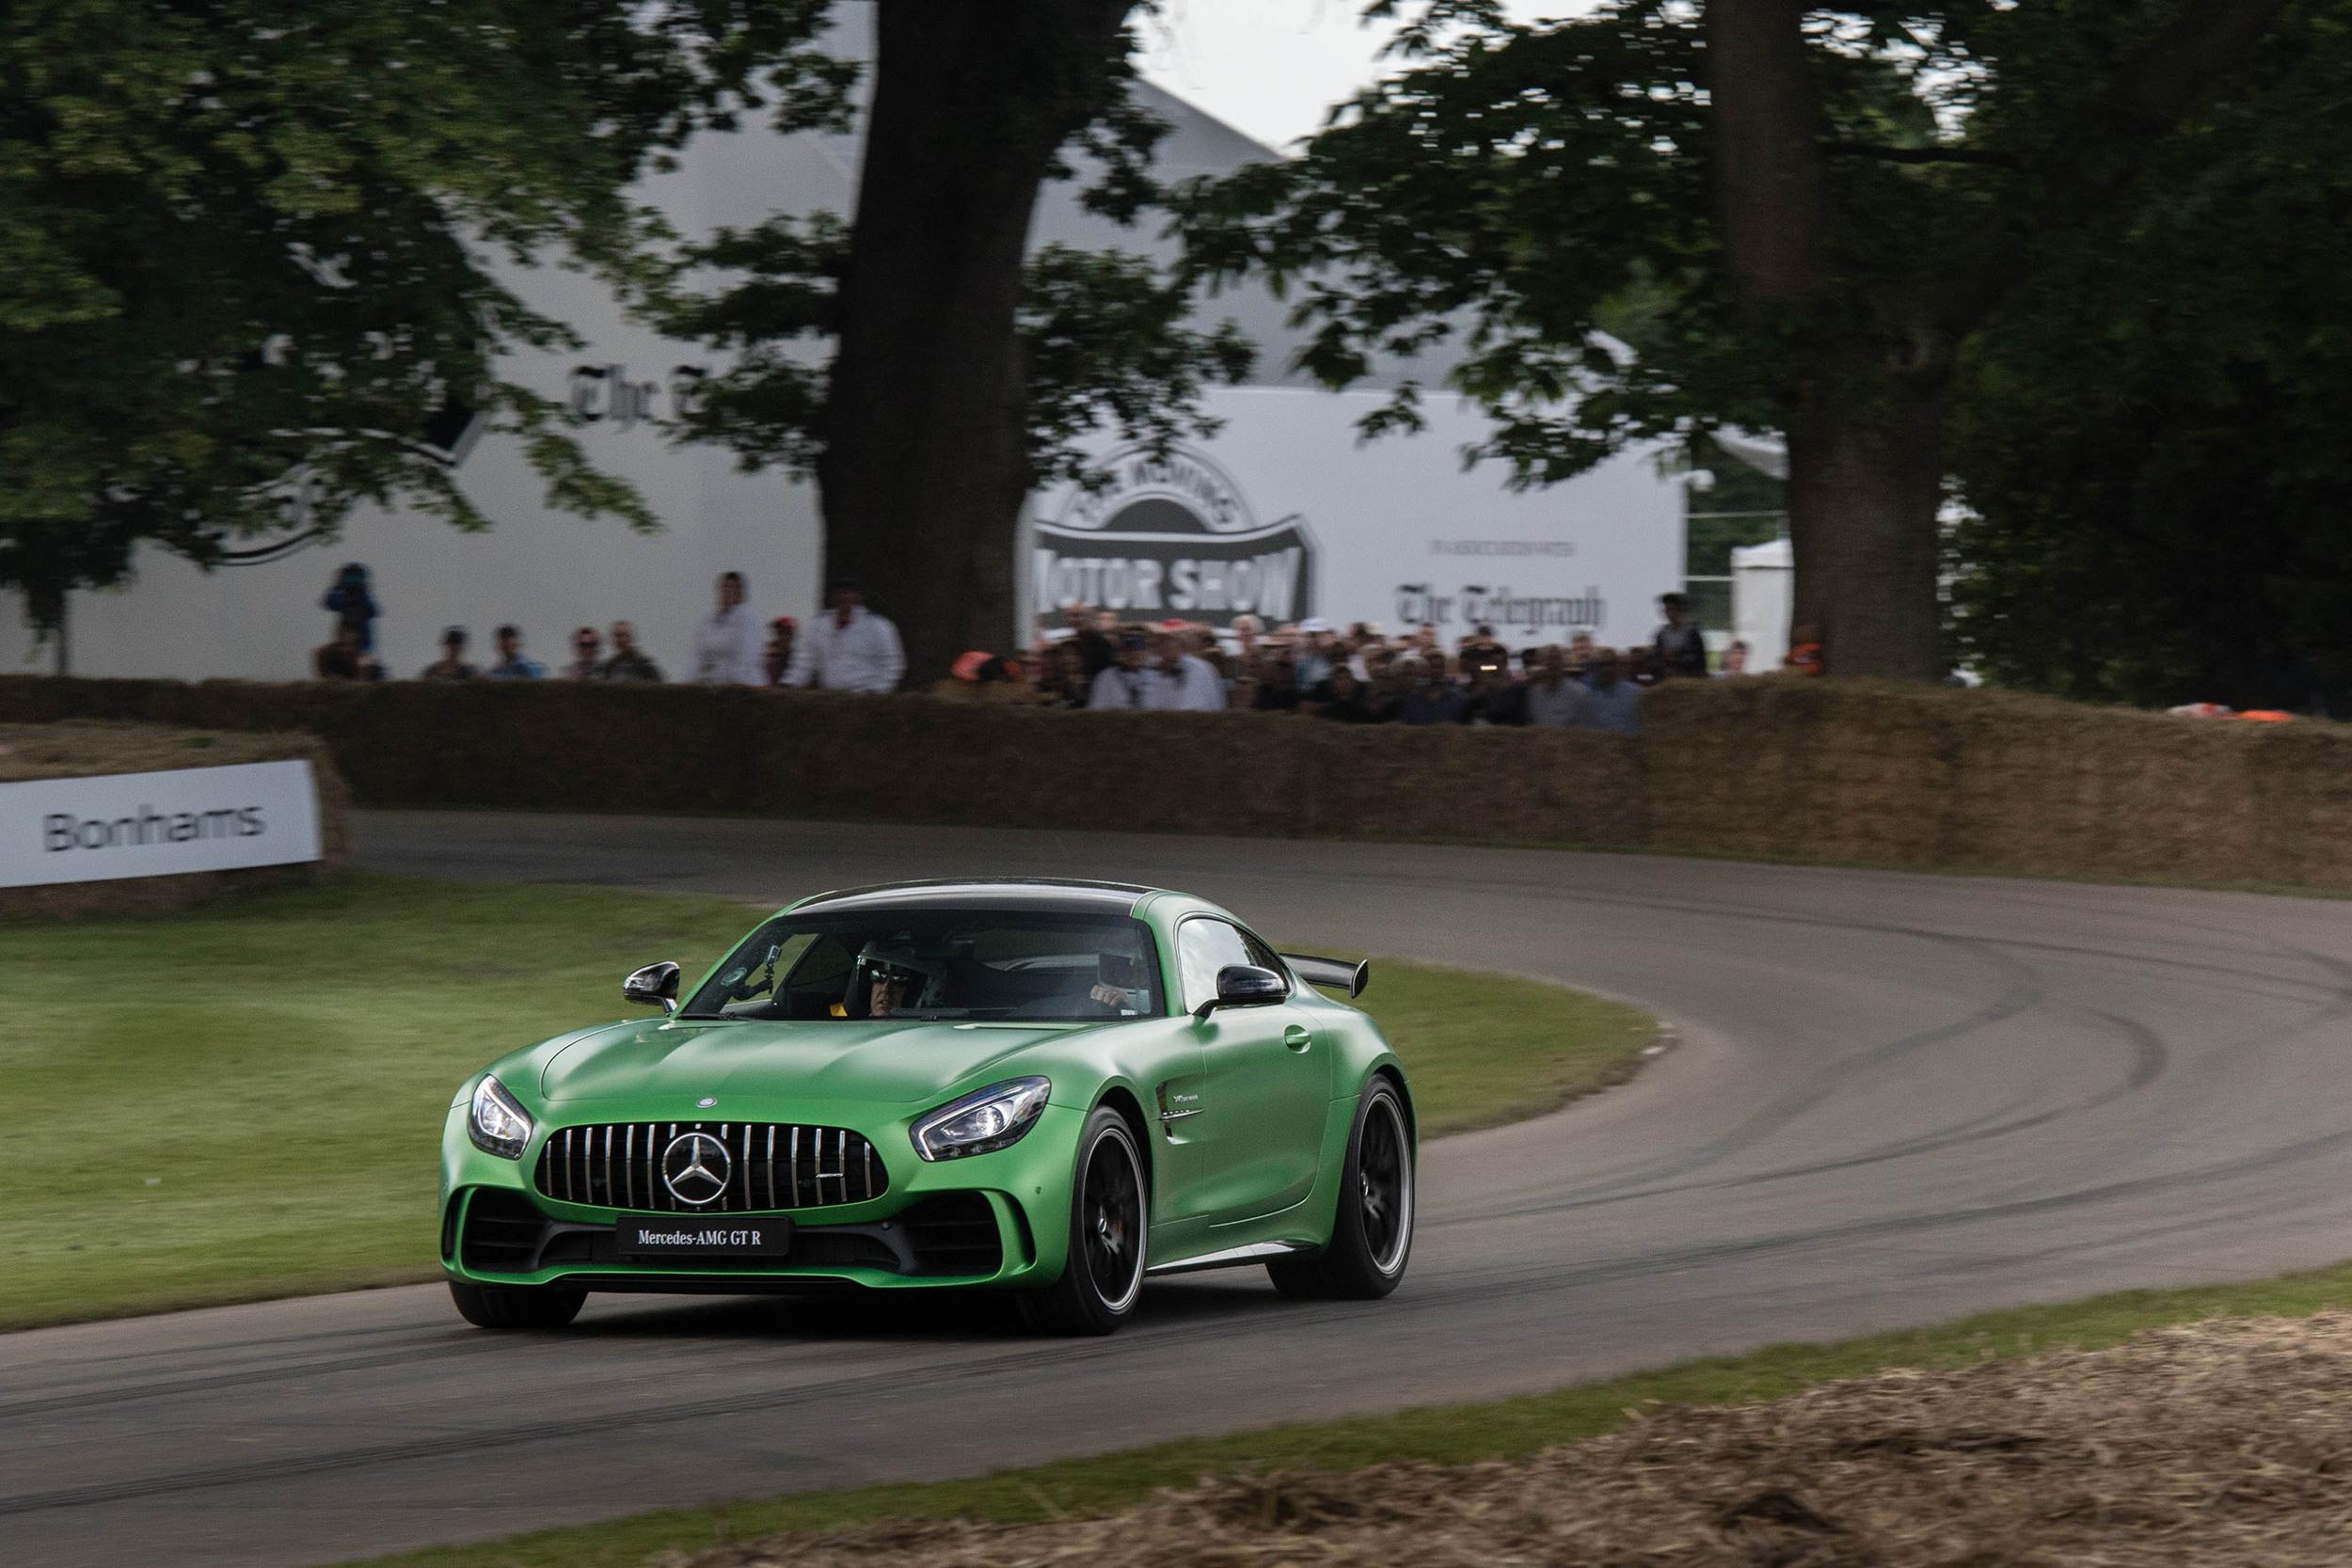 Mercedes-FOS16-536.jpg